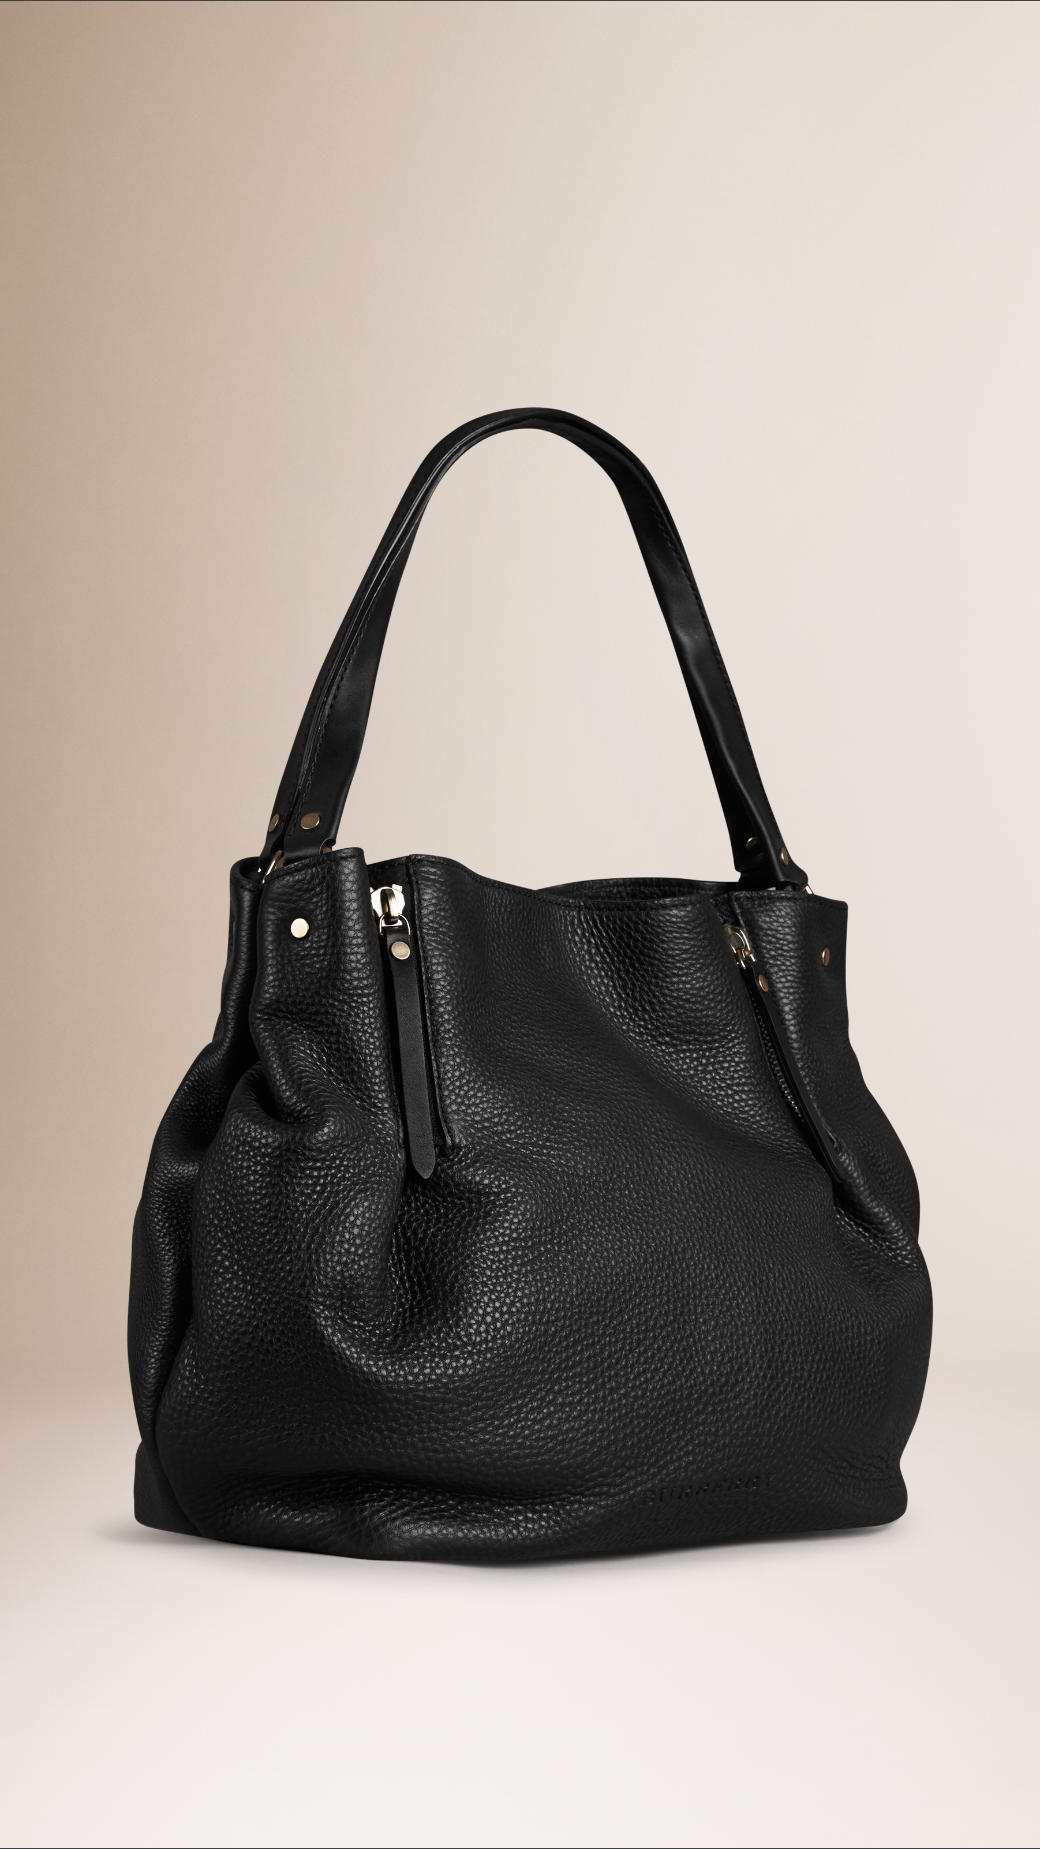 cd60349203e Burberry Medium Zip Detail Leather Tote Bag in Black - Lyst